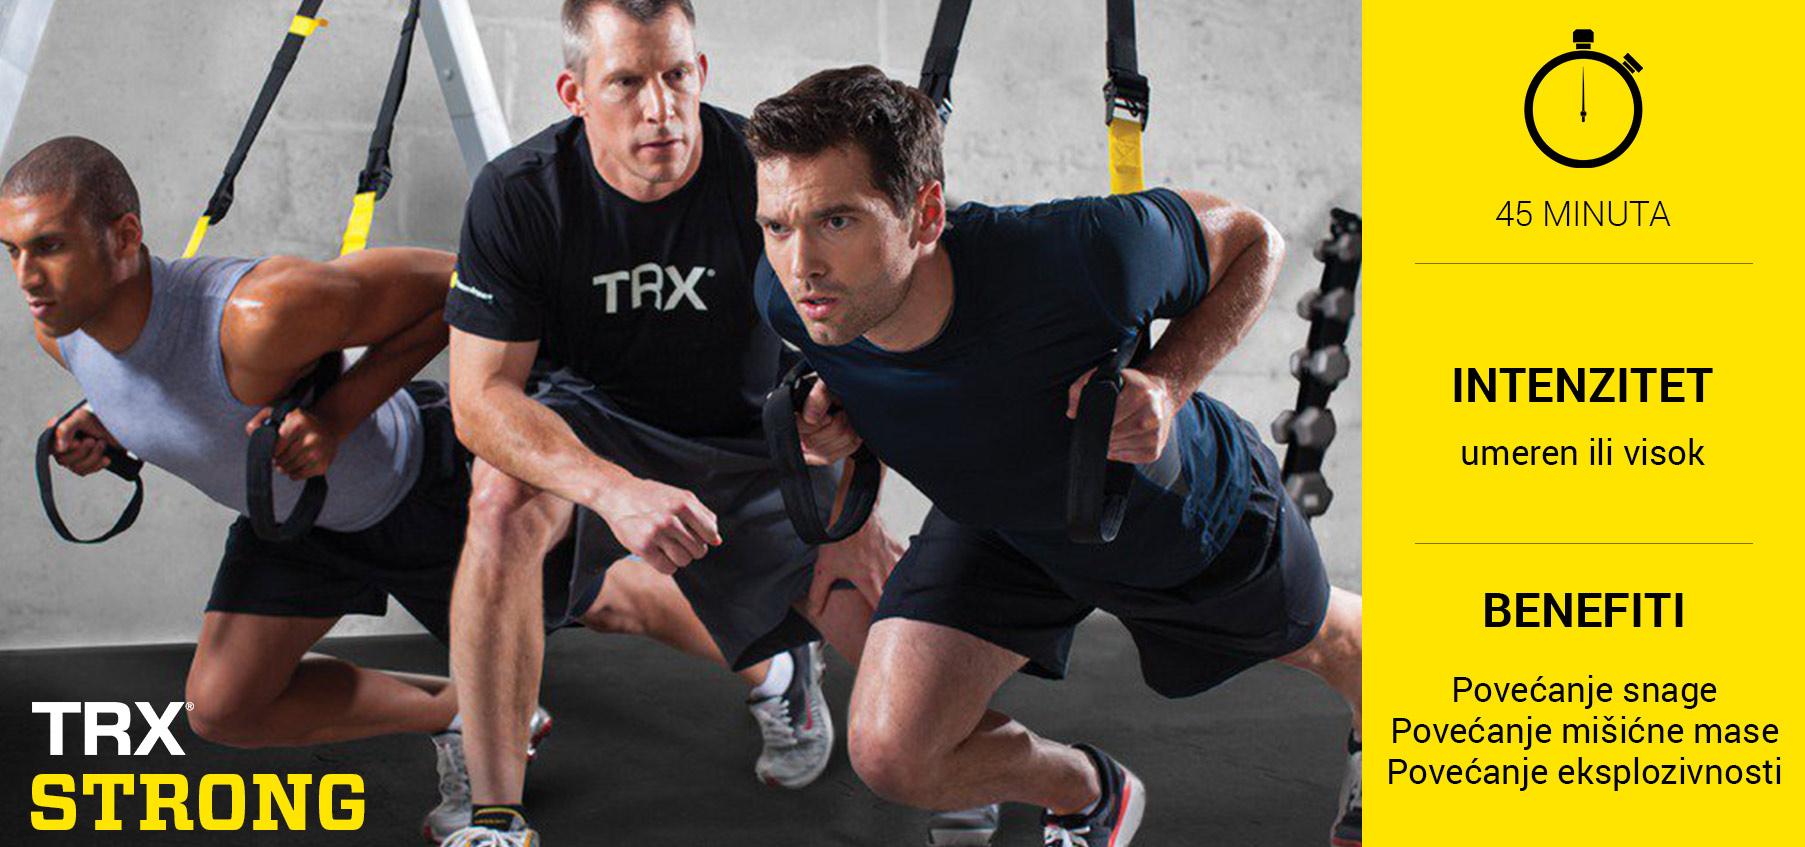 TRX Strong - trening za povećanje snage